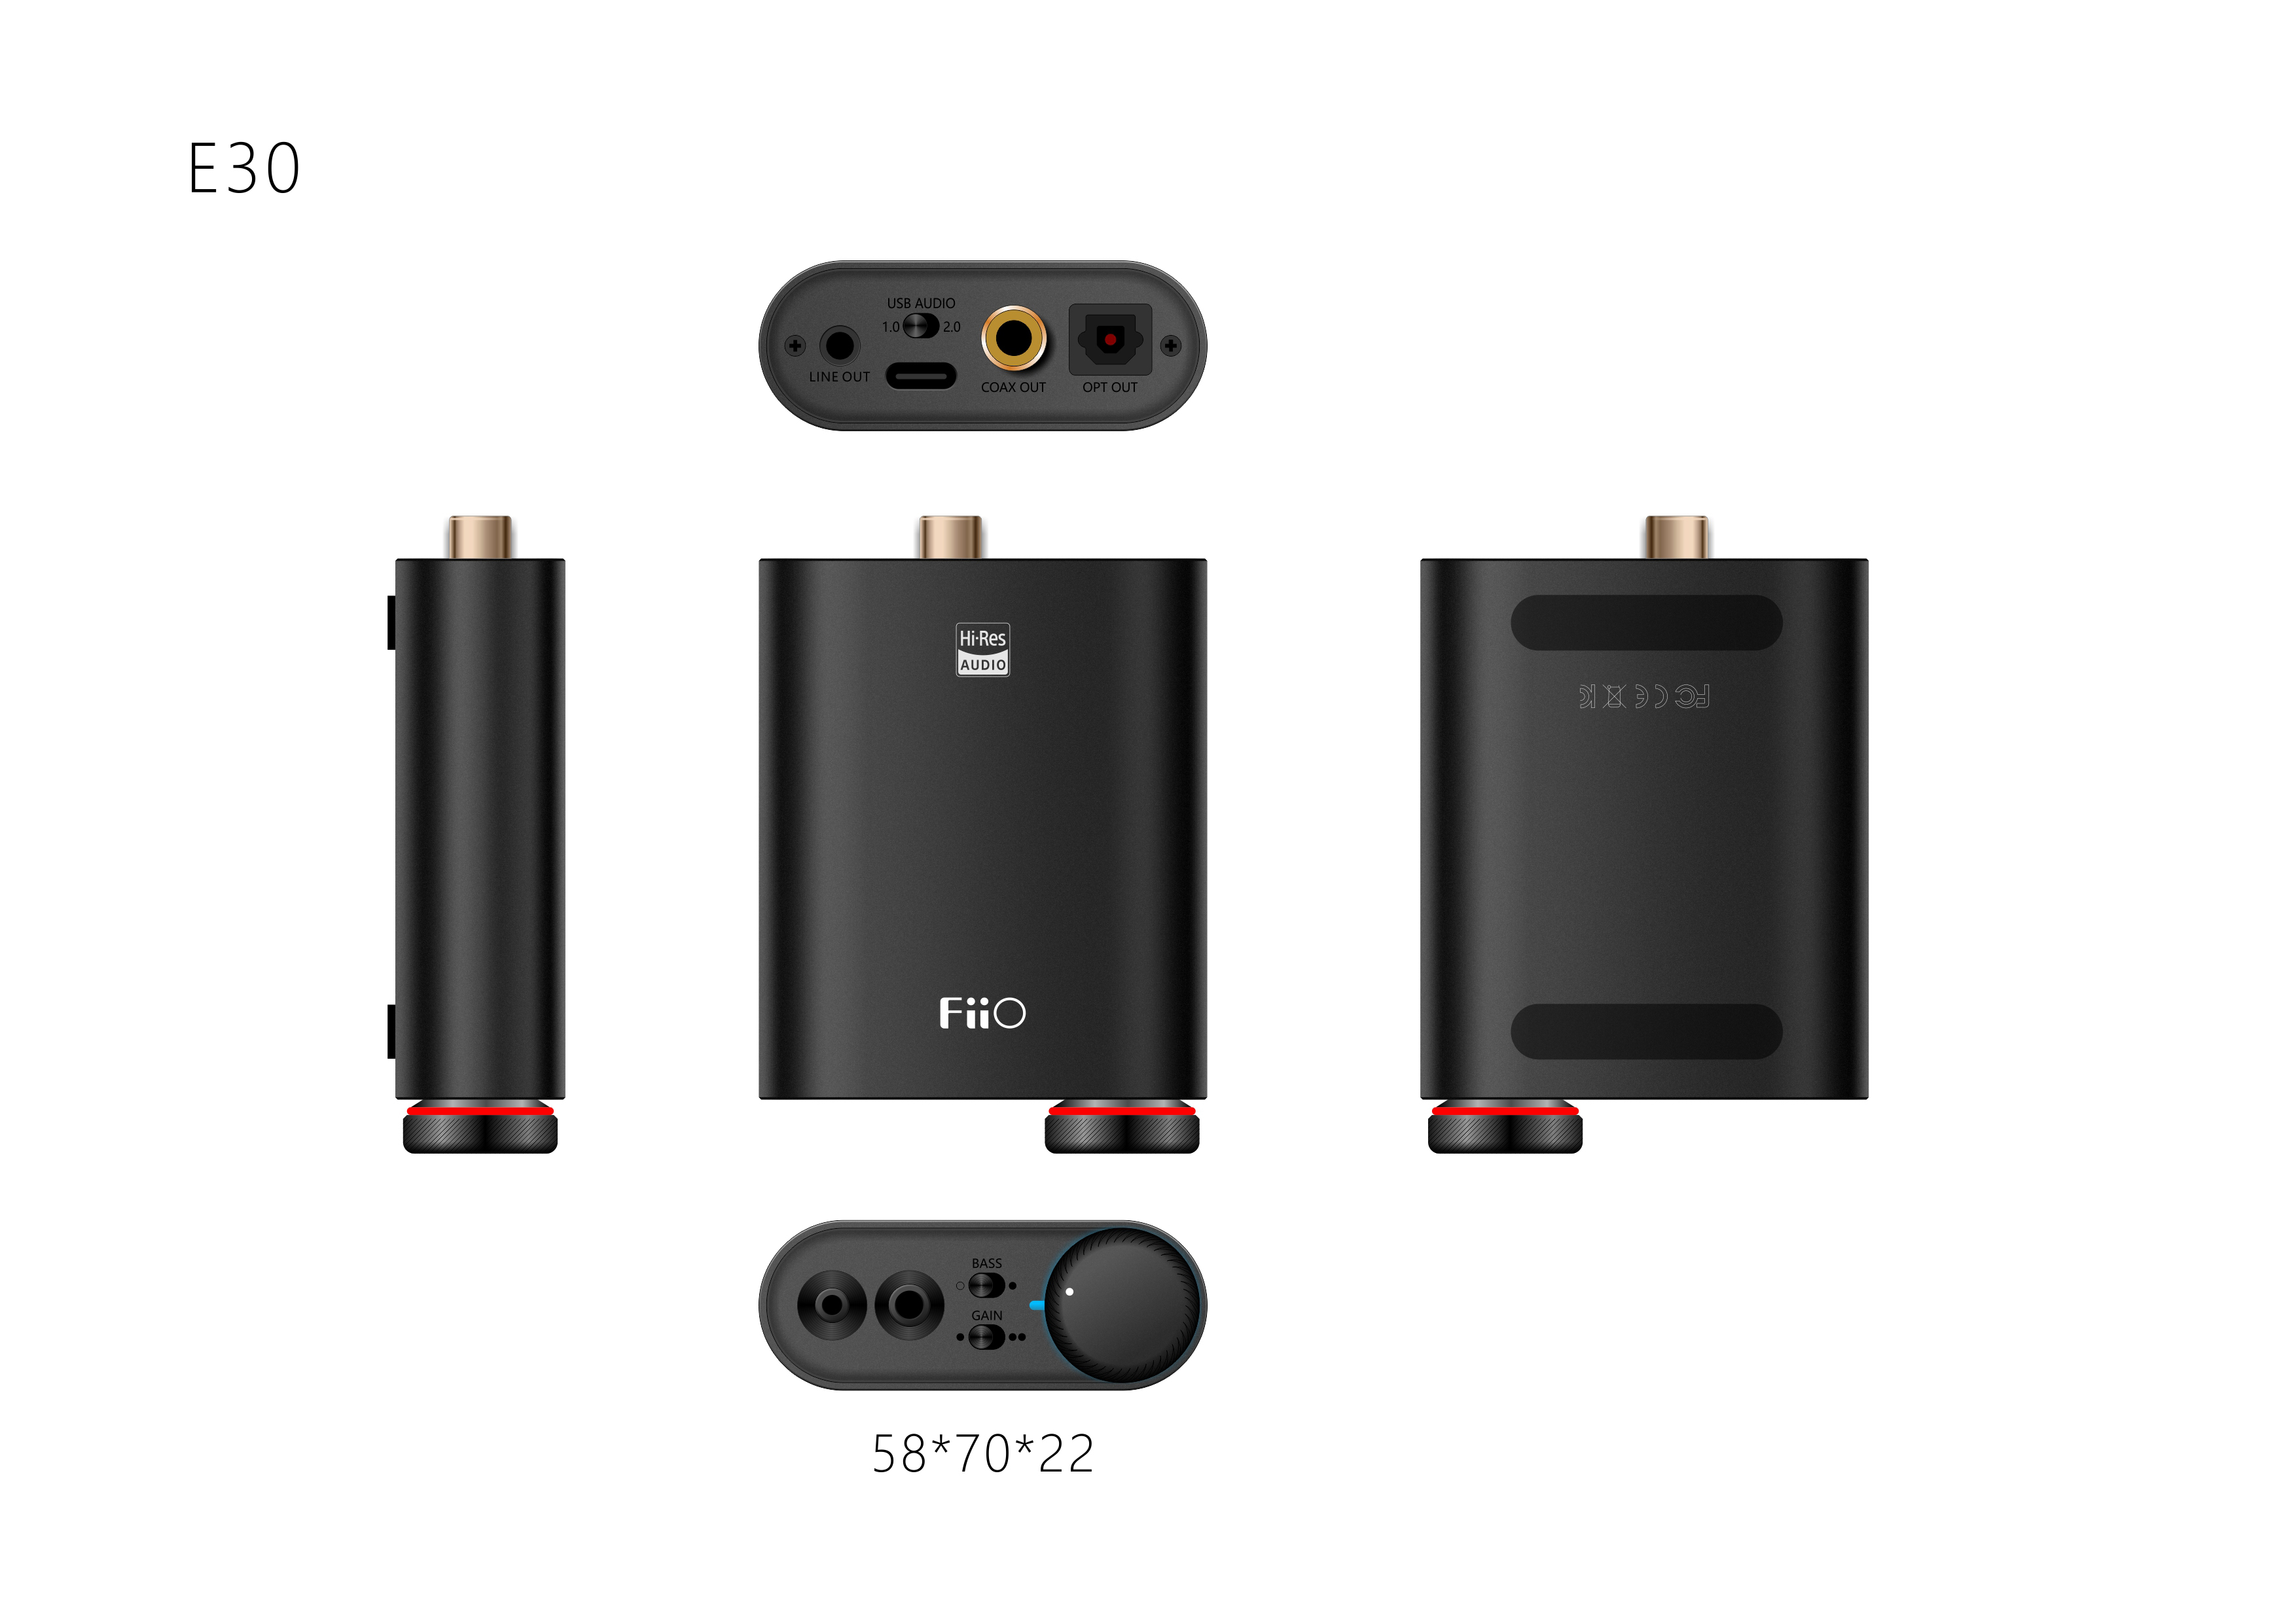 E30-Render2.0-A.jpg